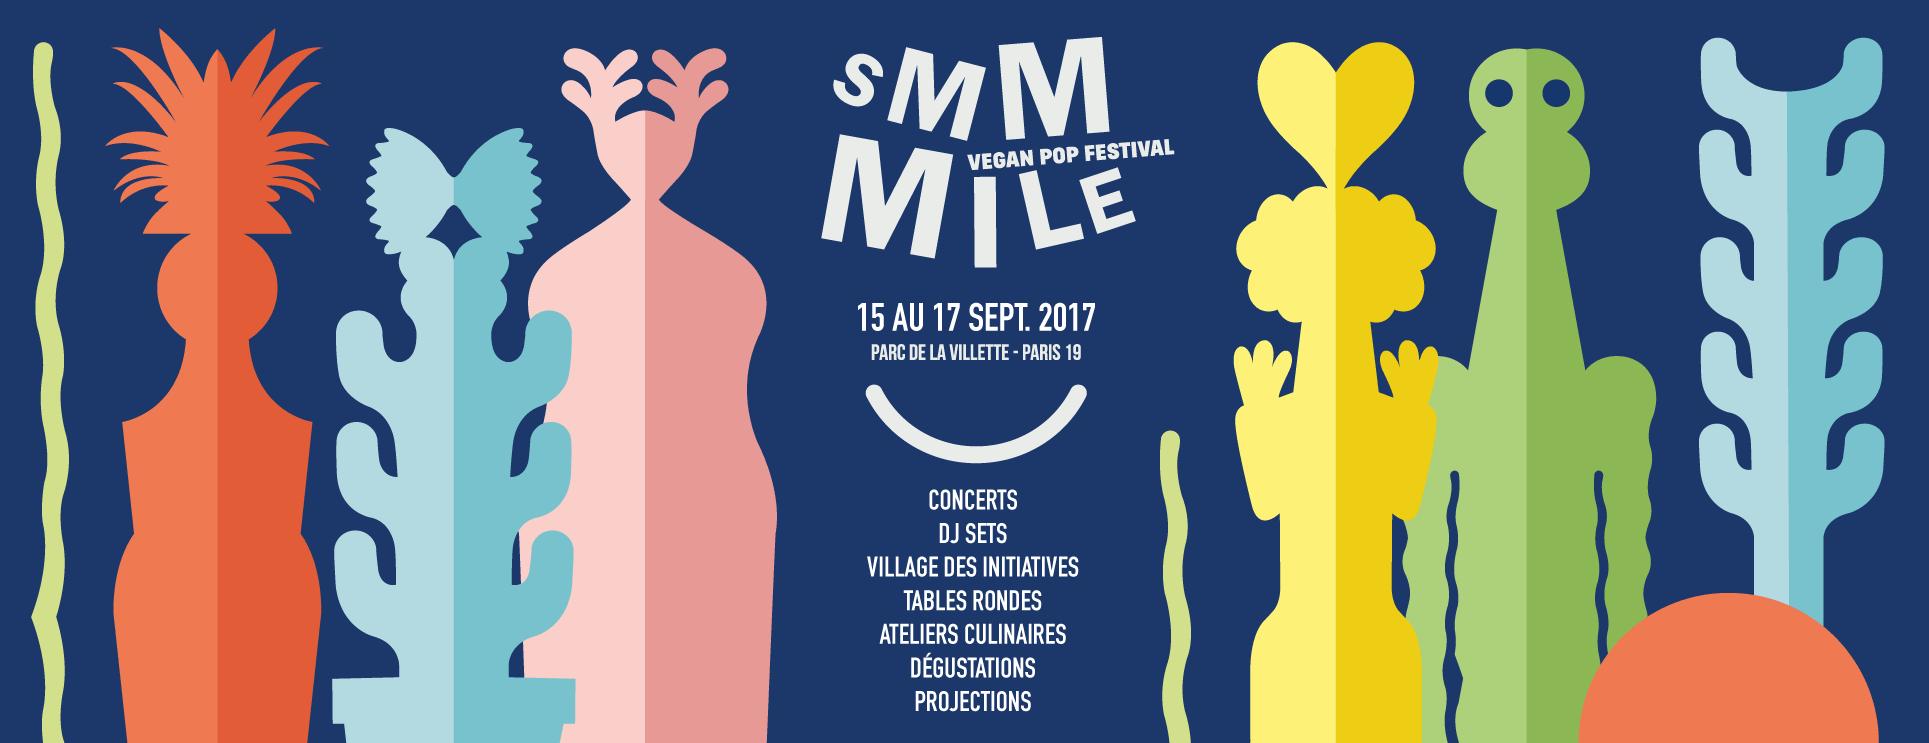 smmmile-manifesto21